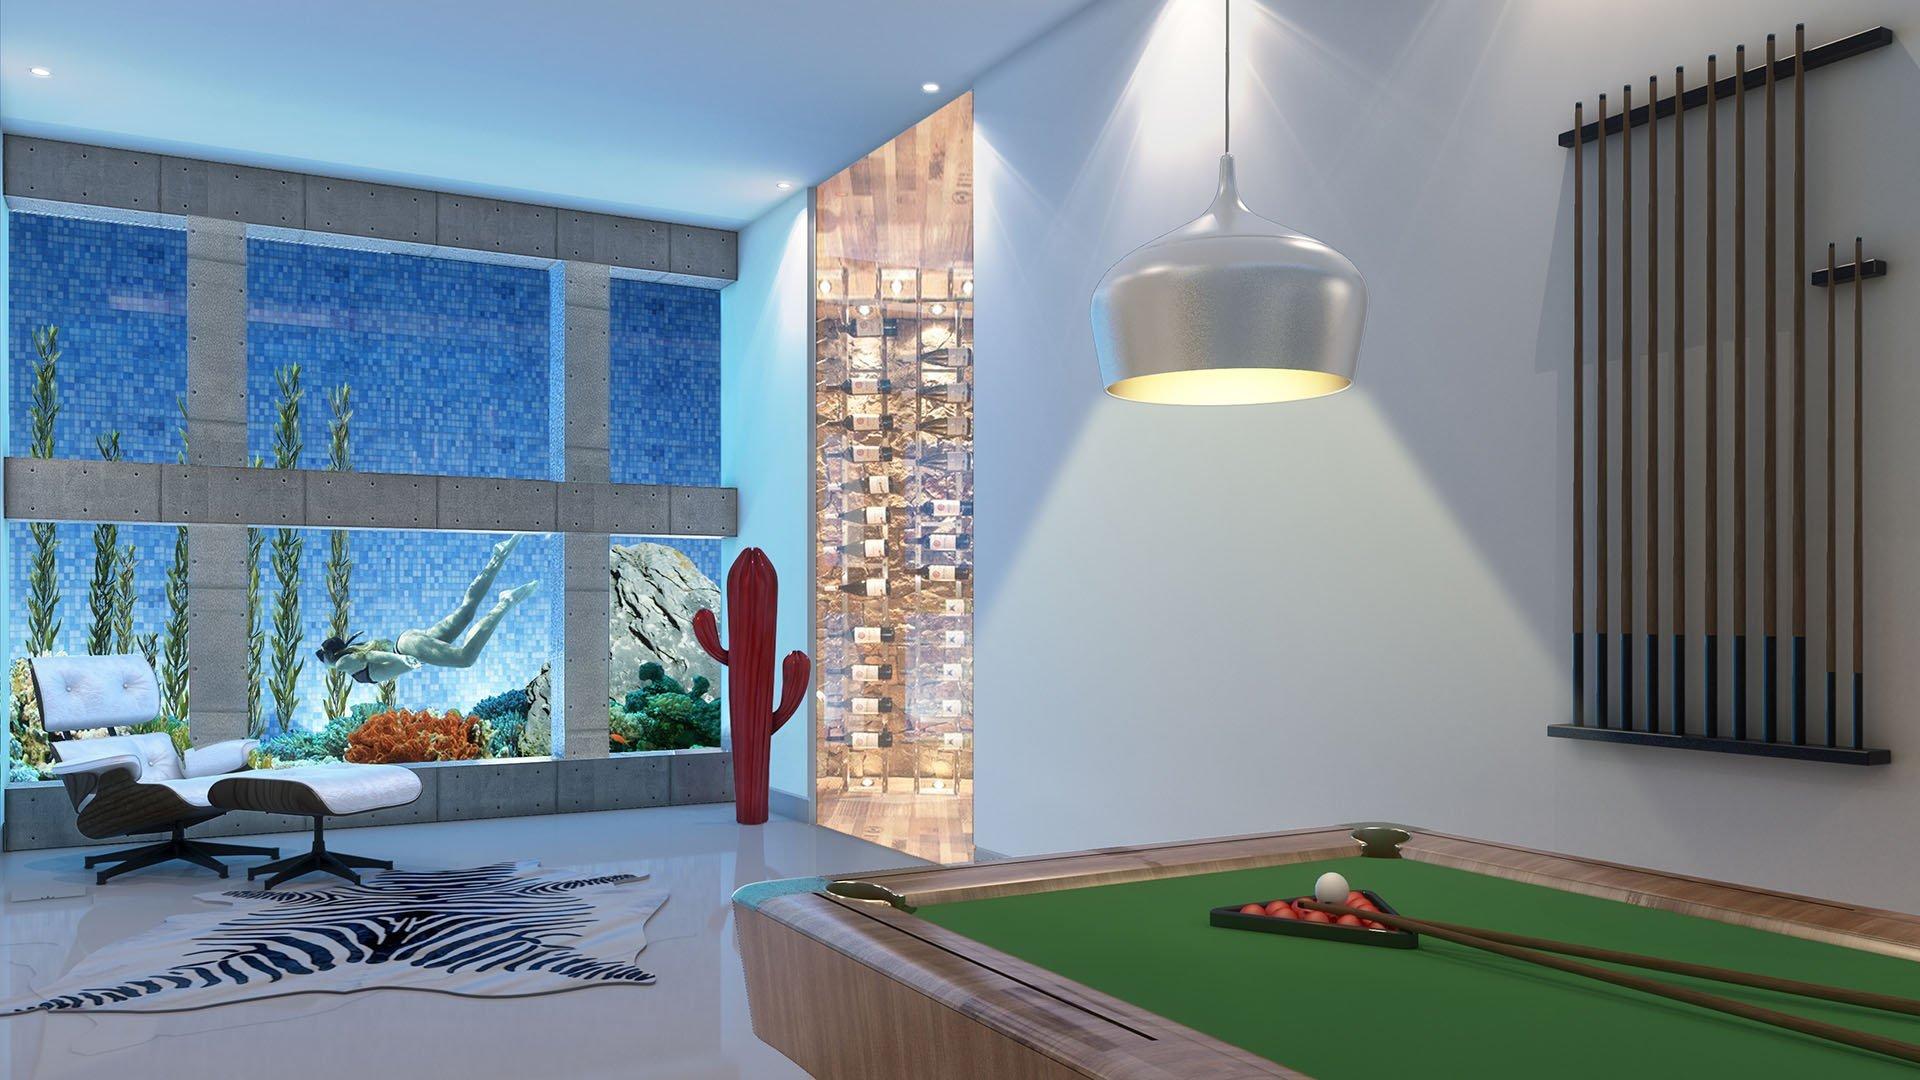 Villa Absolute: Prachtige villa aan de Golden Mile in Marbella